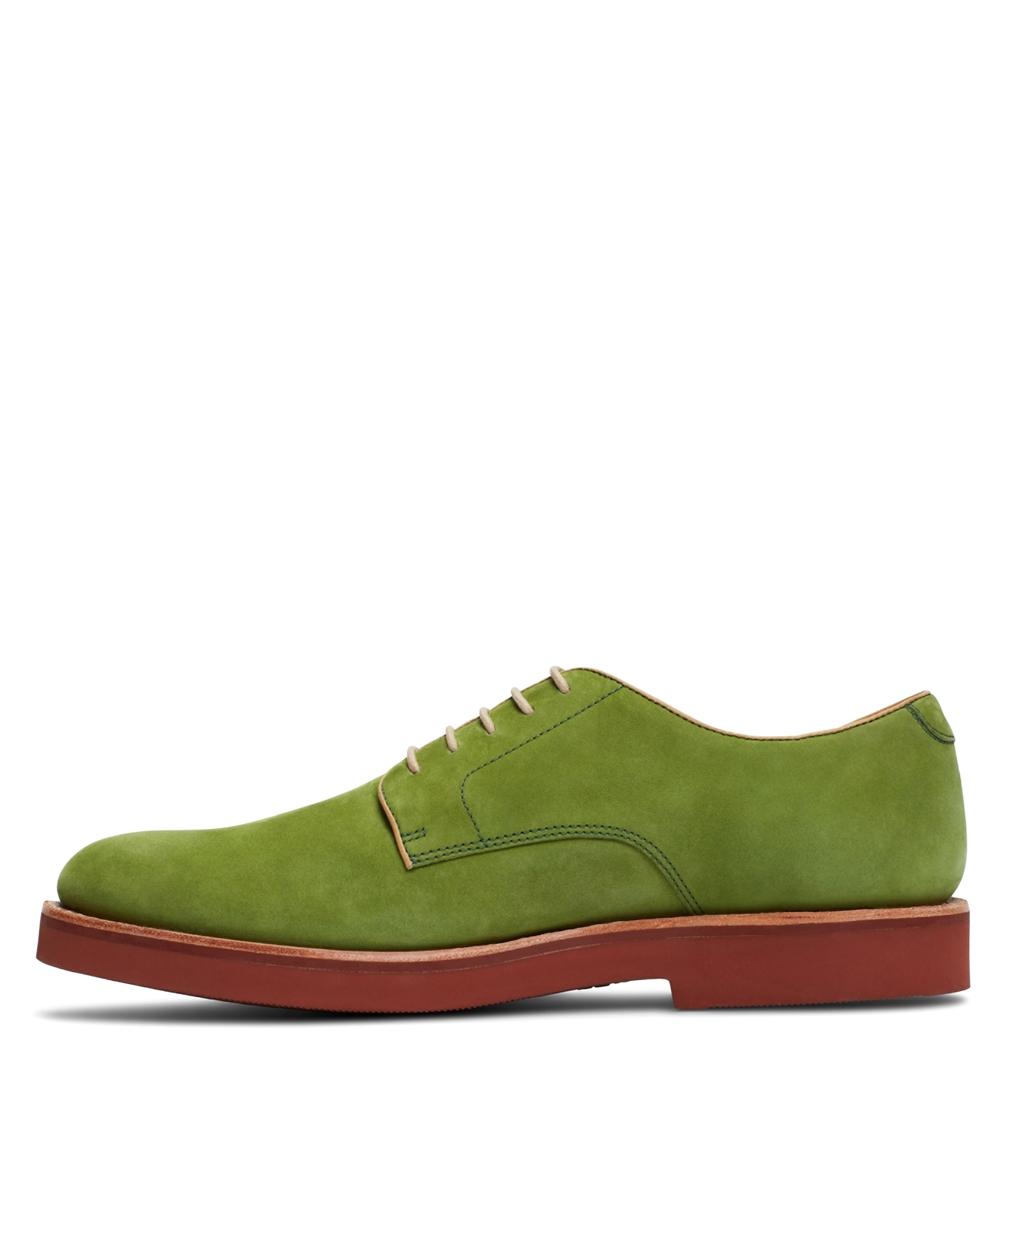 green suede nubuck brick sole derby